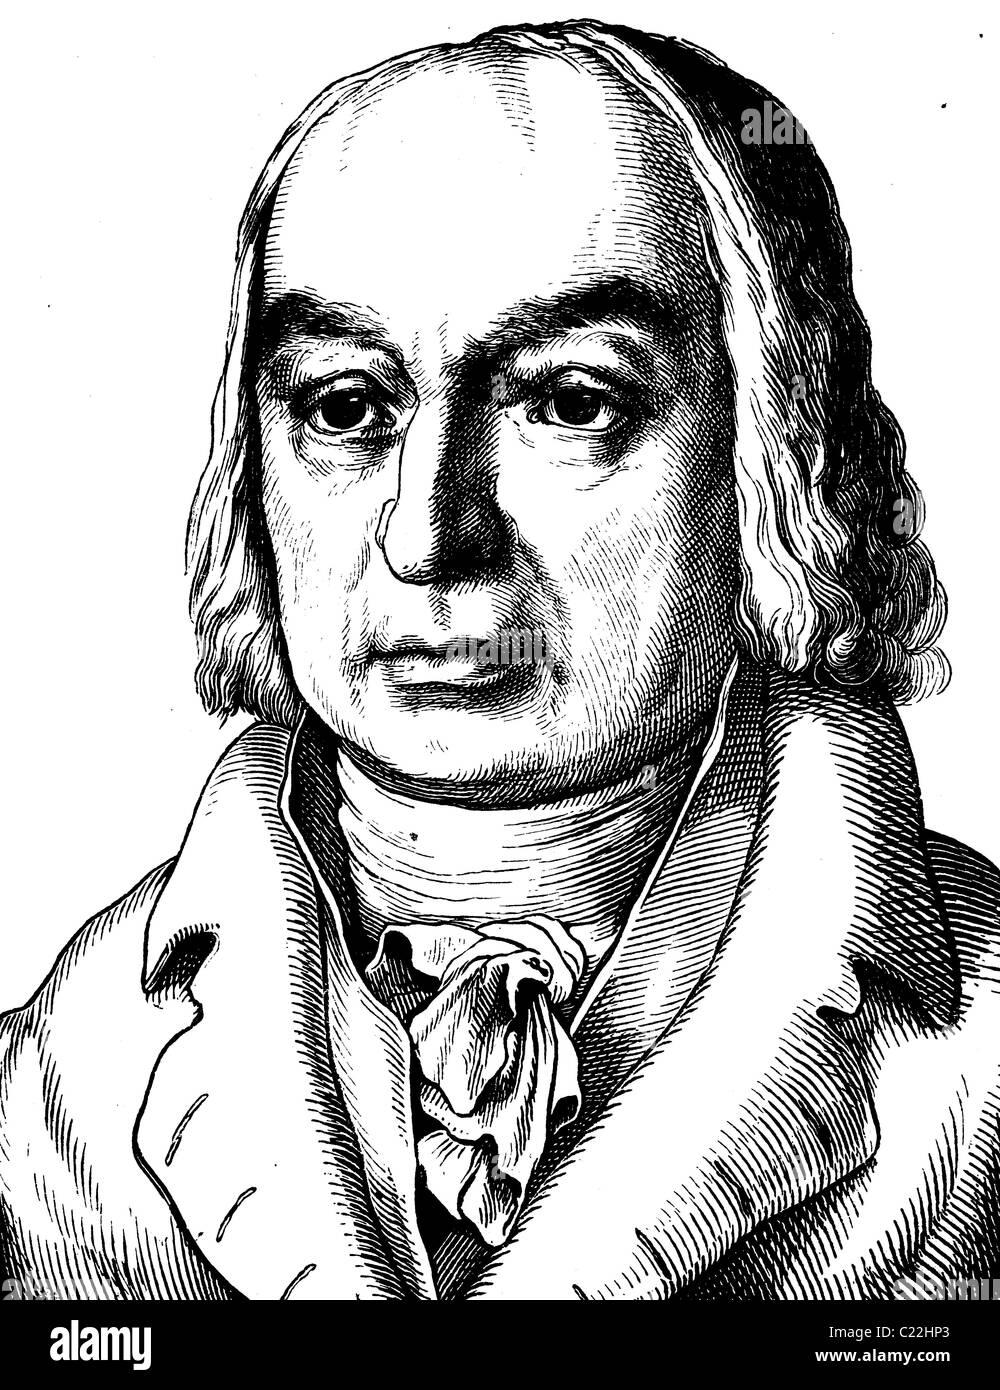 Franz de Paula Gruithuisen, 1774 - 1852, astronomer and naturalist, portrait, historical illustration, 1880 - Stock Image